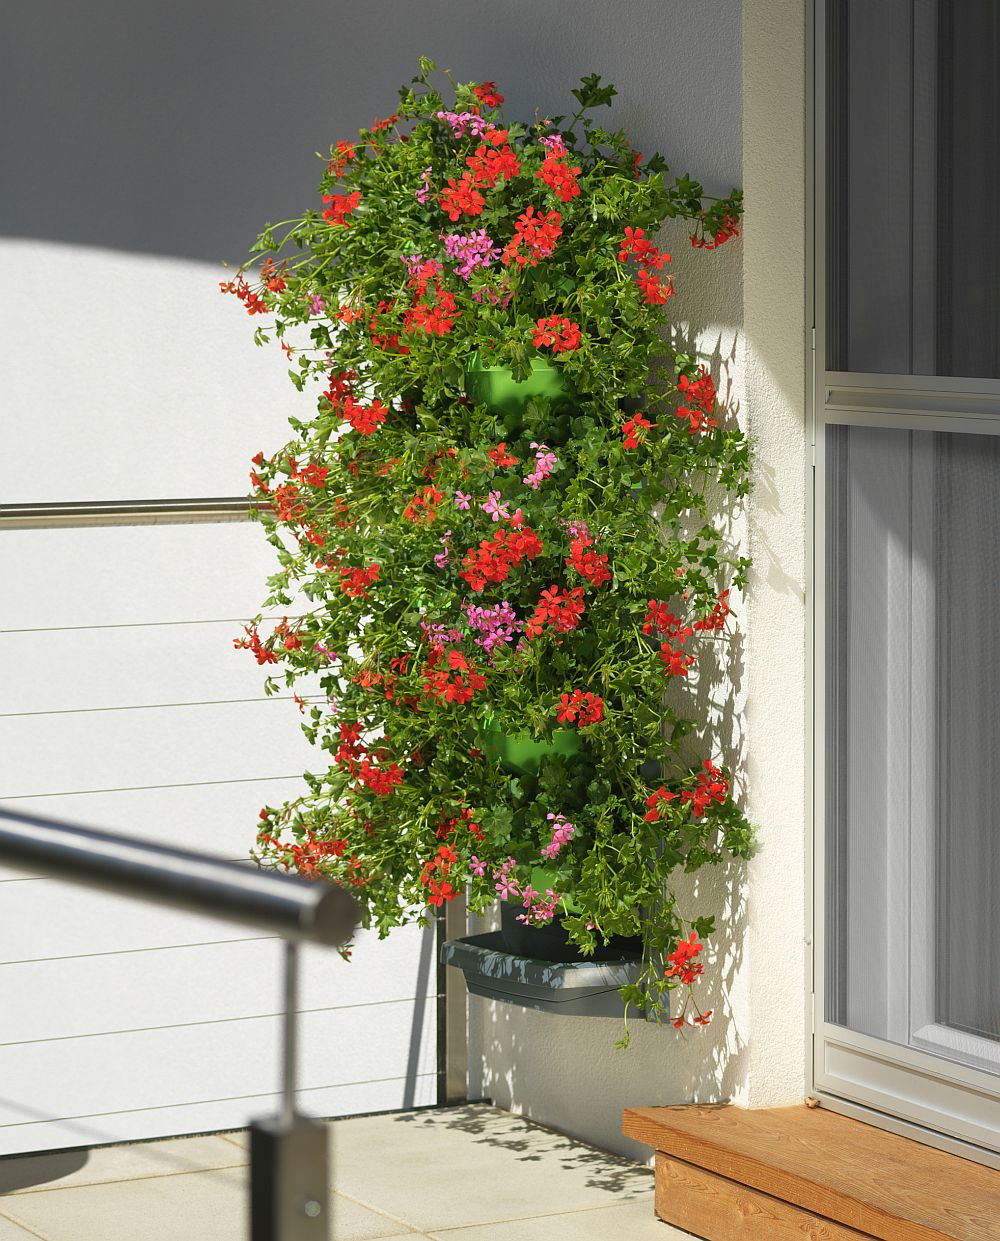 Jardinier vertical ingenioas ideal pentru balcoane i - Jardiniere verticale ...